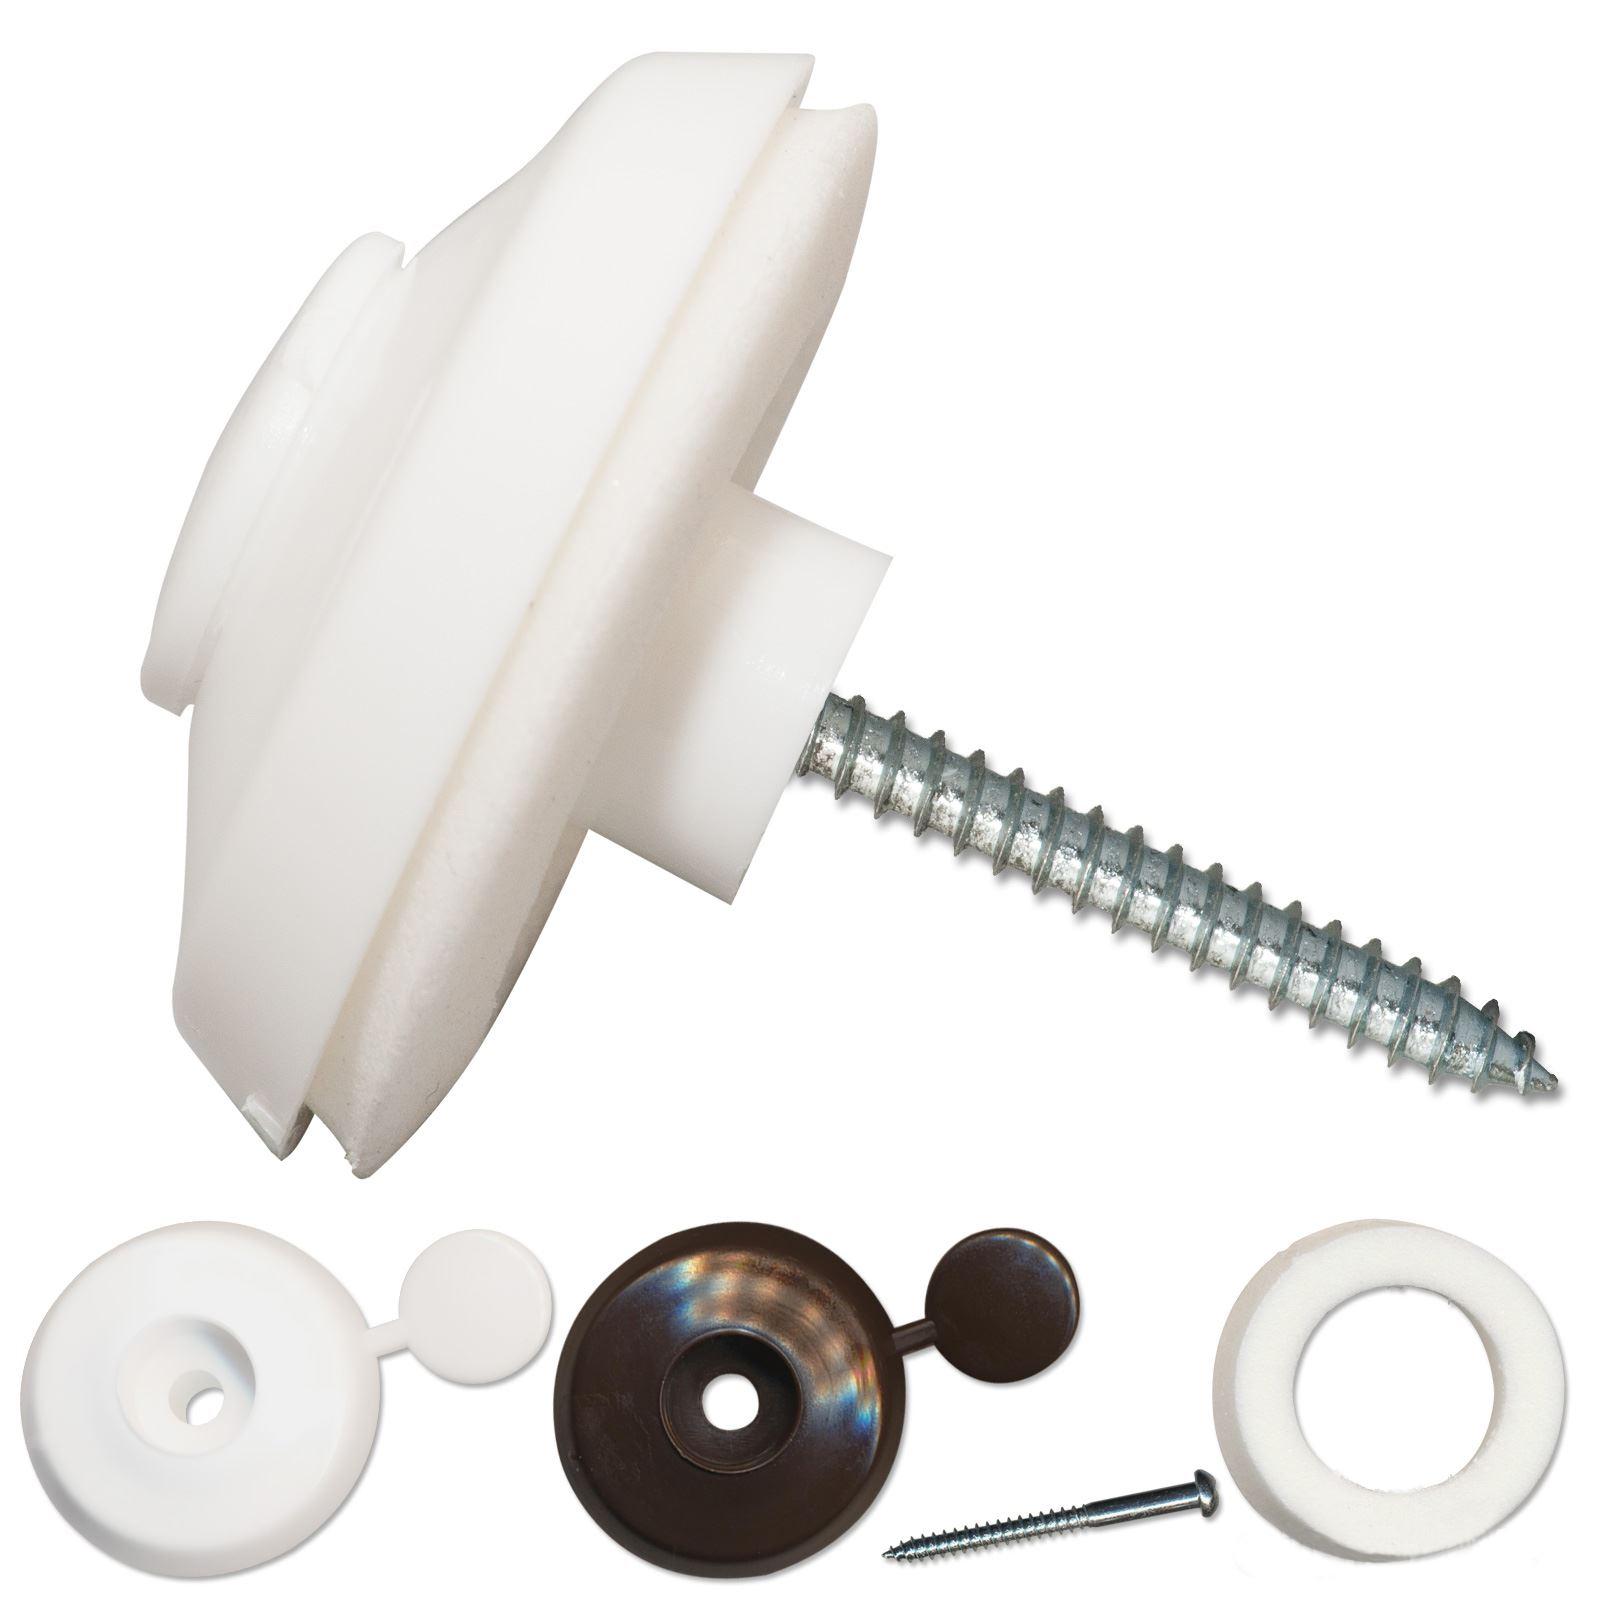 10 X 10mm Polycarbonate Sheet Fixing Buttons Screws